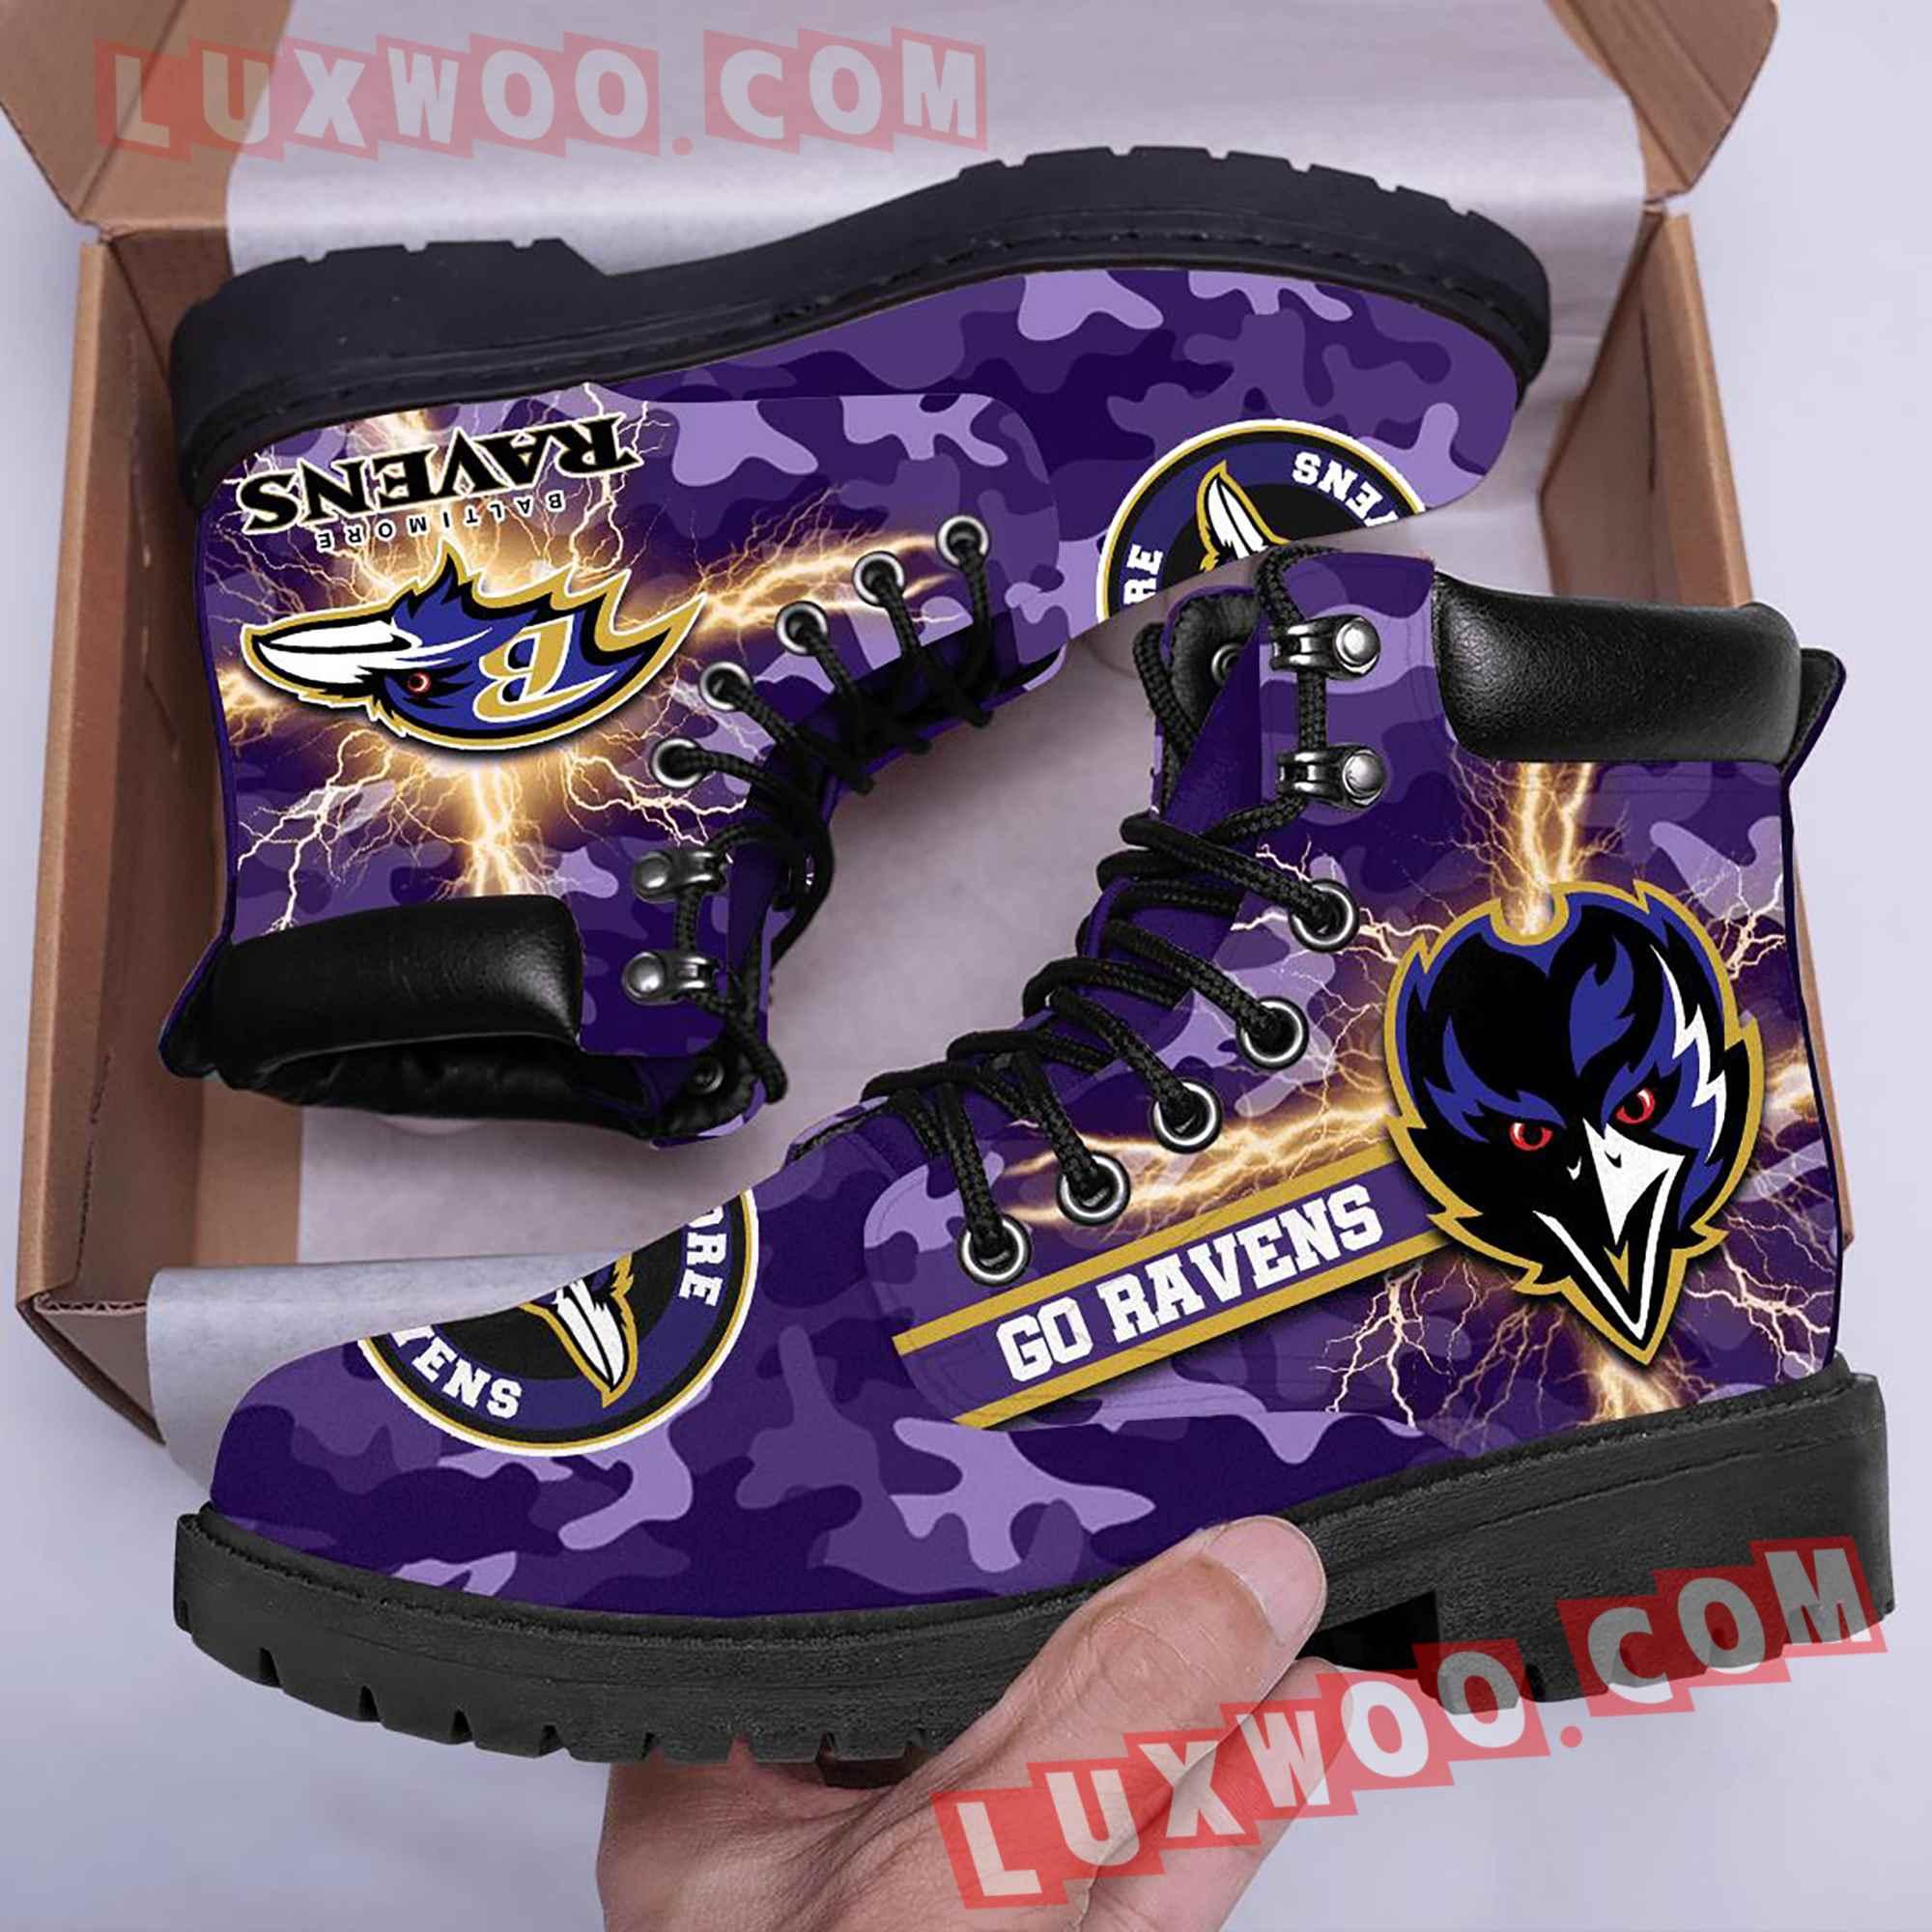 Baltimore Ravens Nfl Season Boots Shoes V2